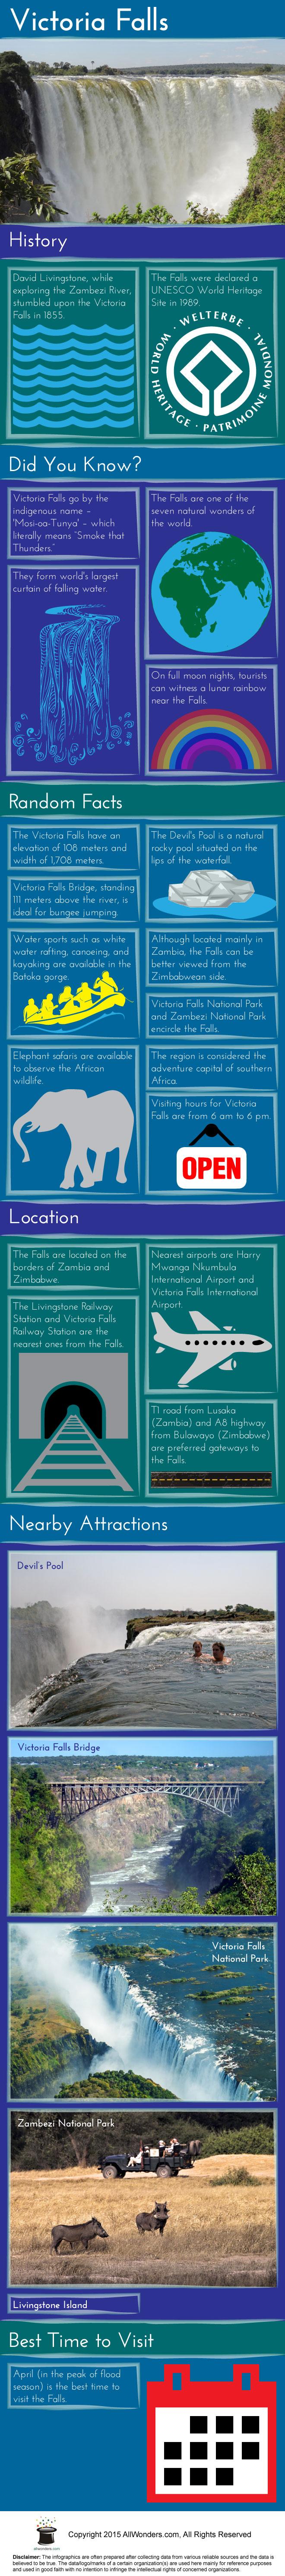 Victoria Falls Infographic